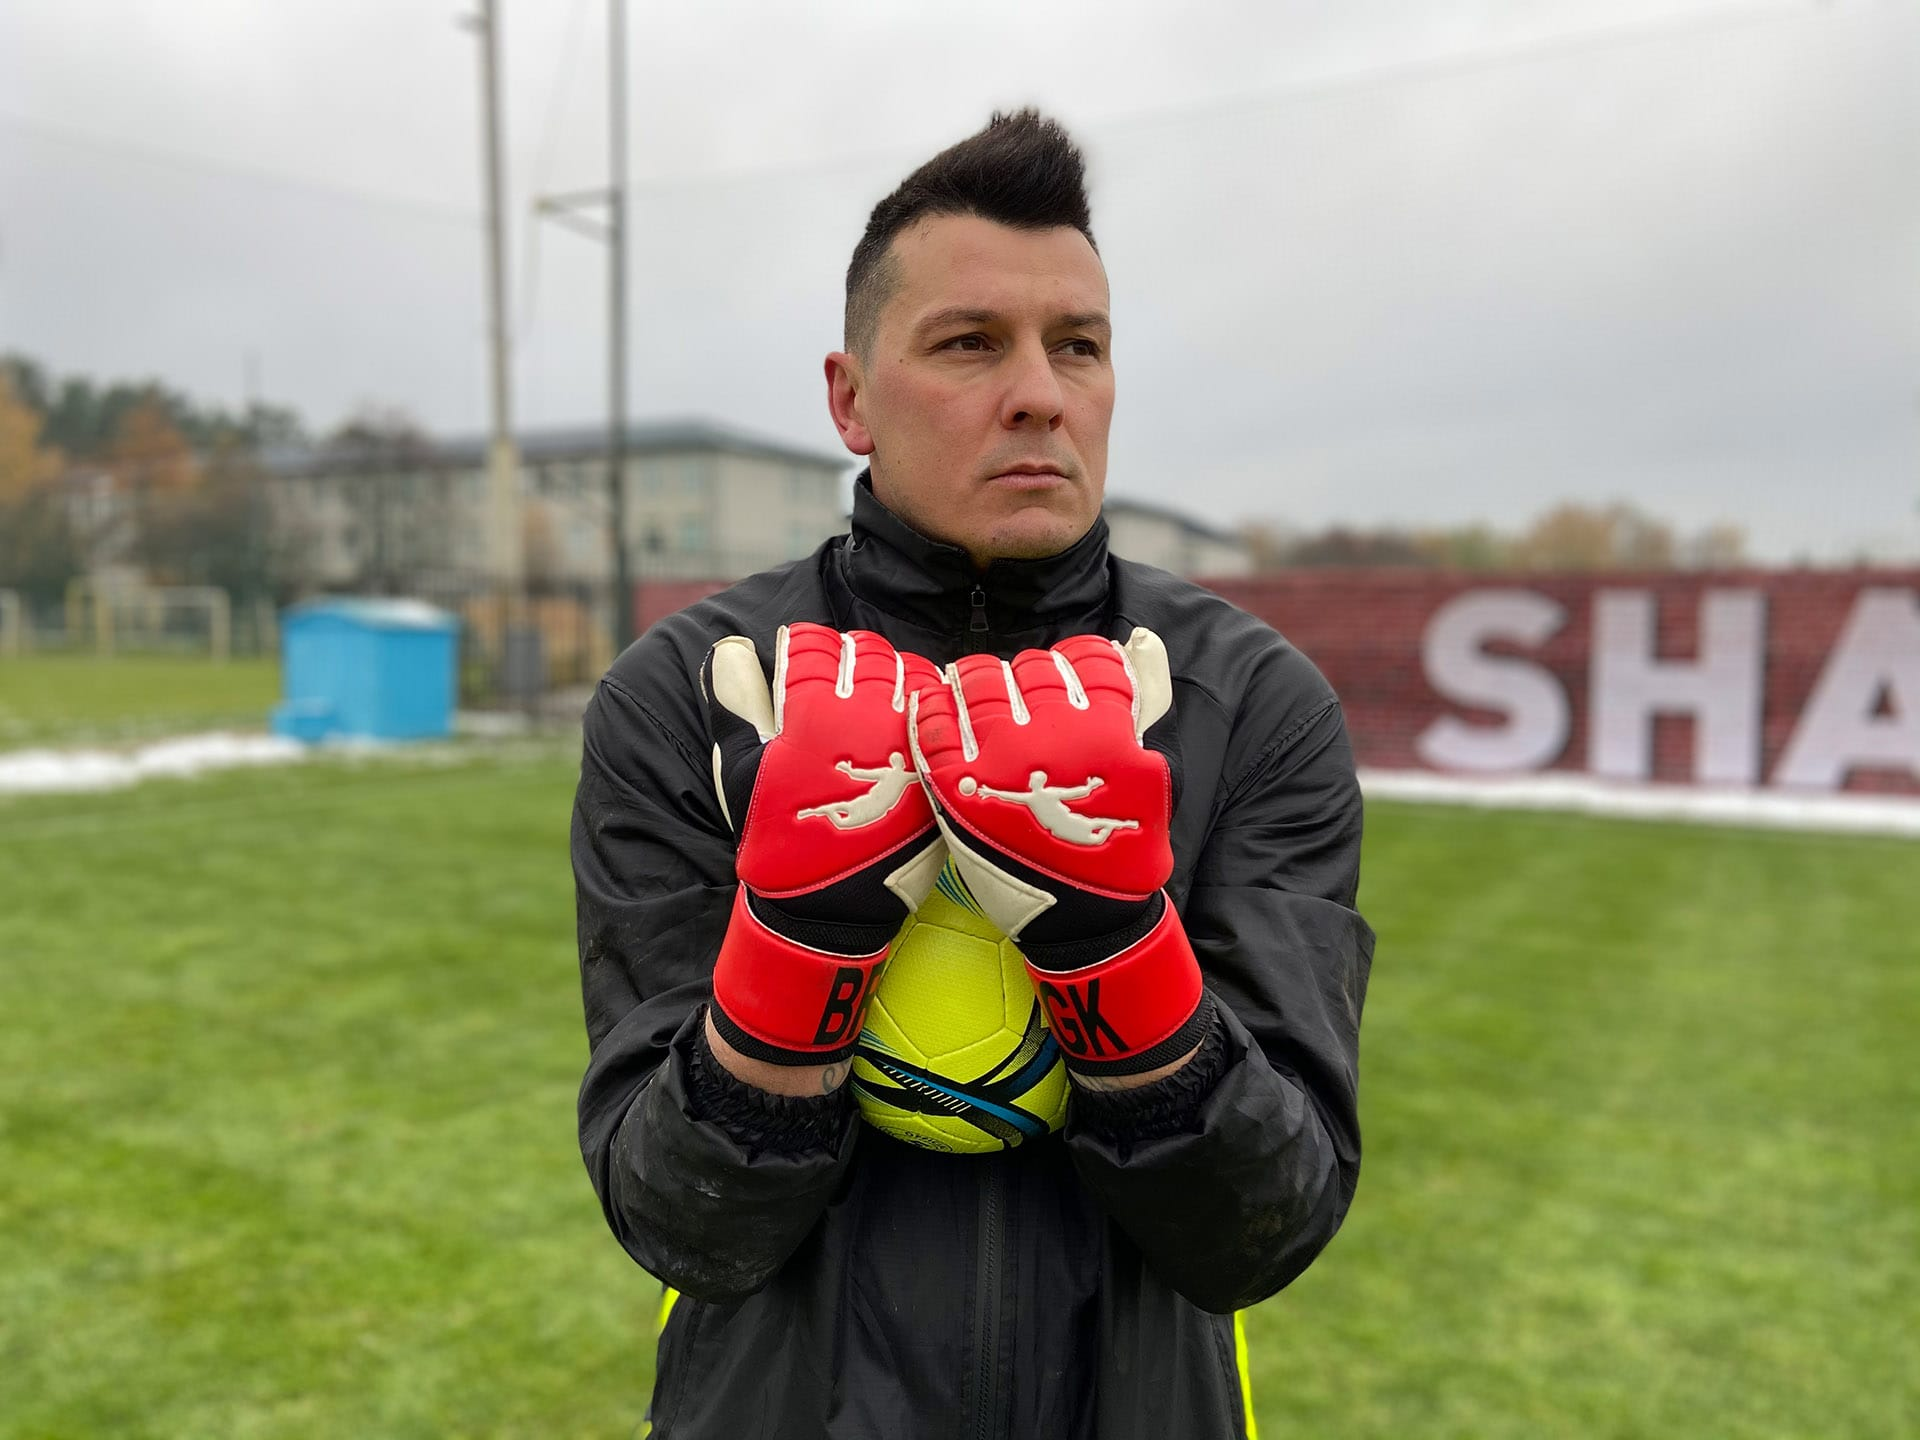 Воротарські рукавиці Brave GK Skill  - офіційний інтернет-магазин Brave GK